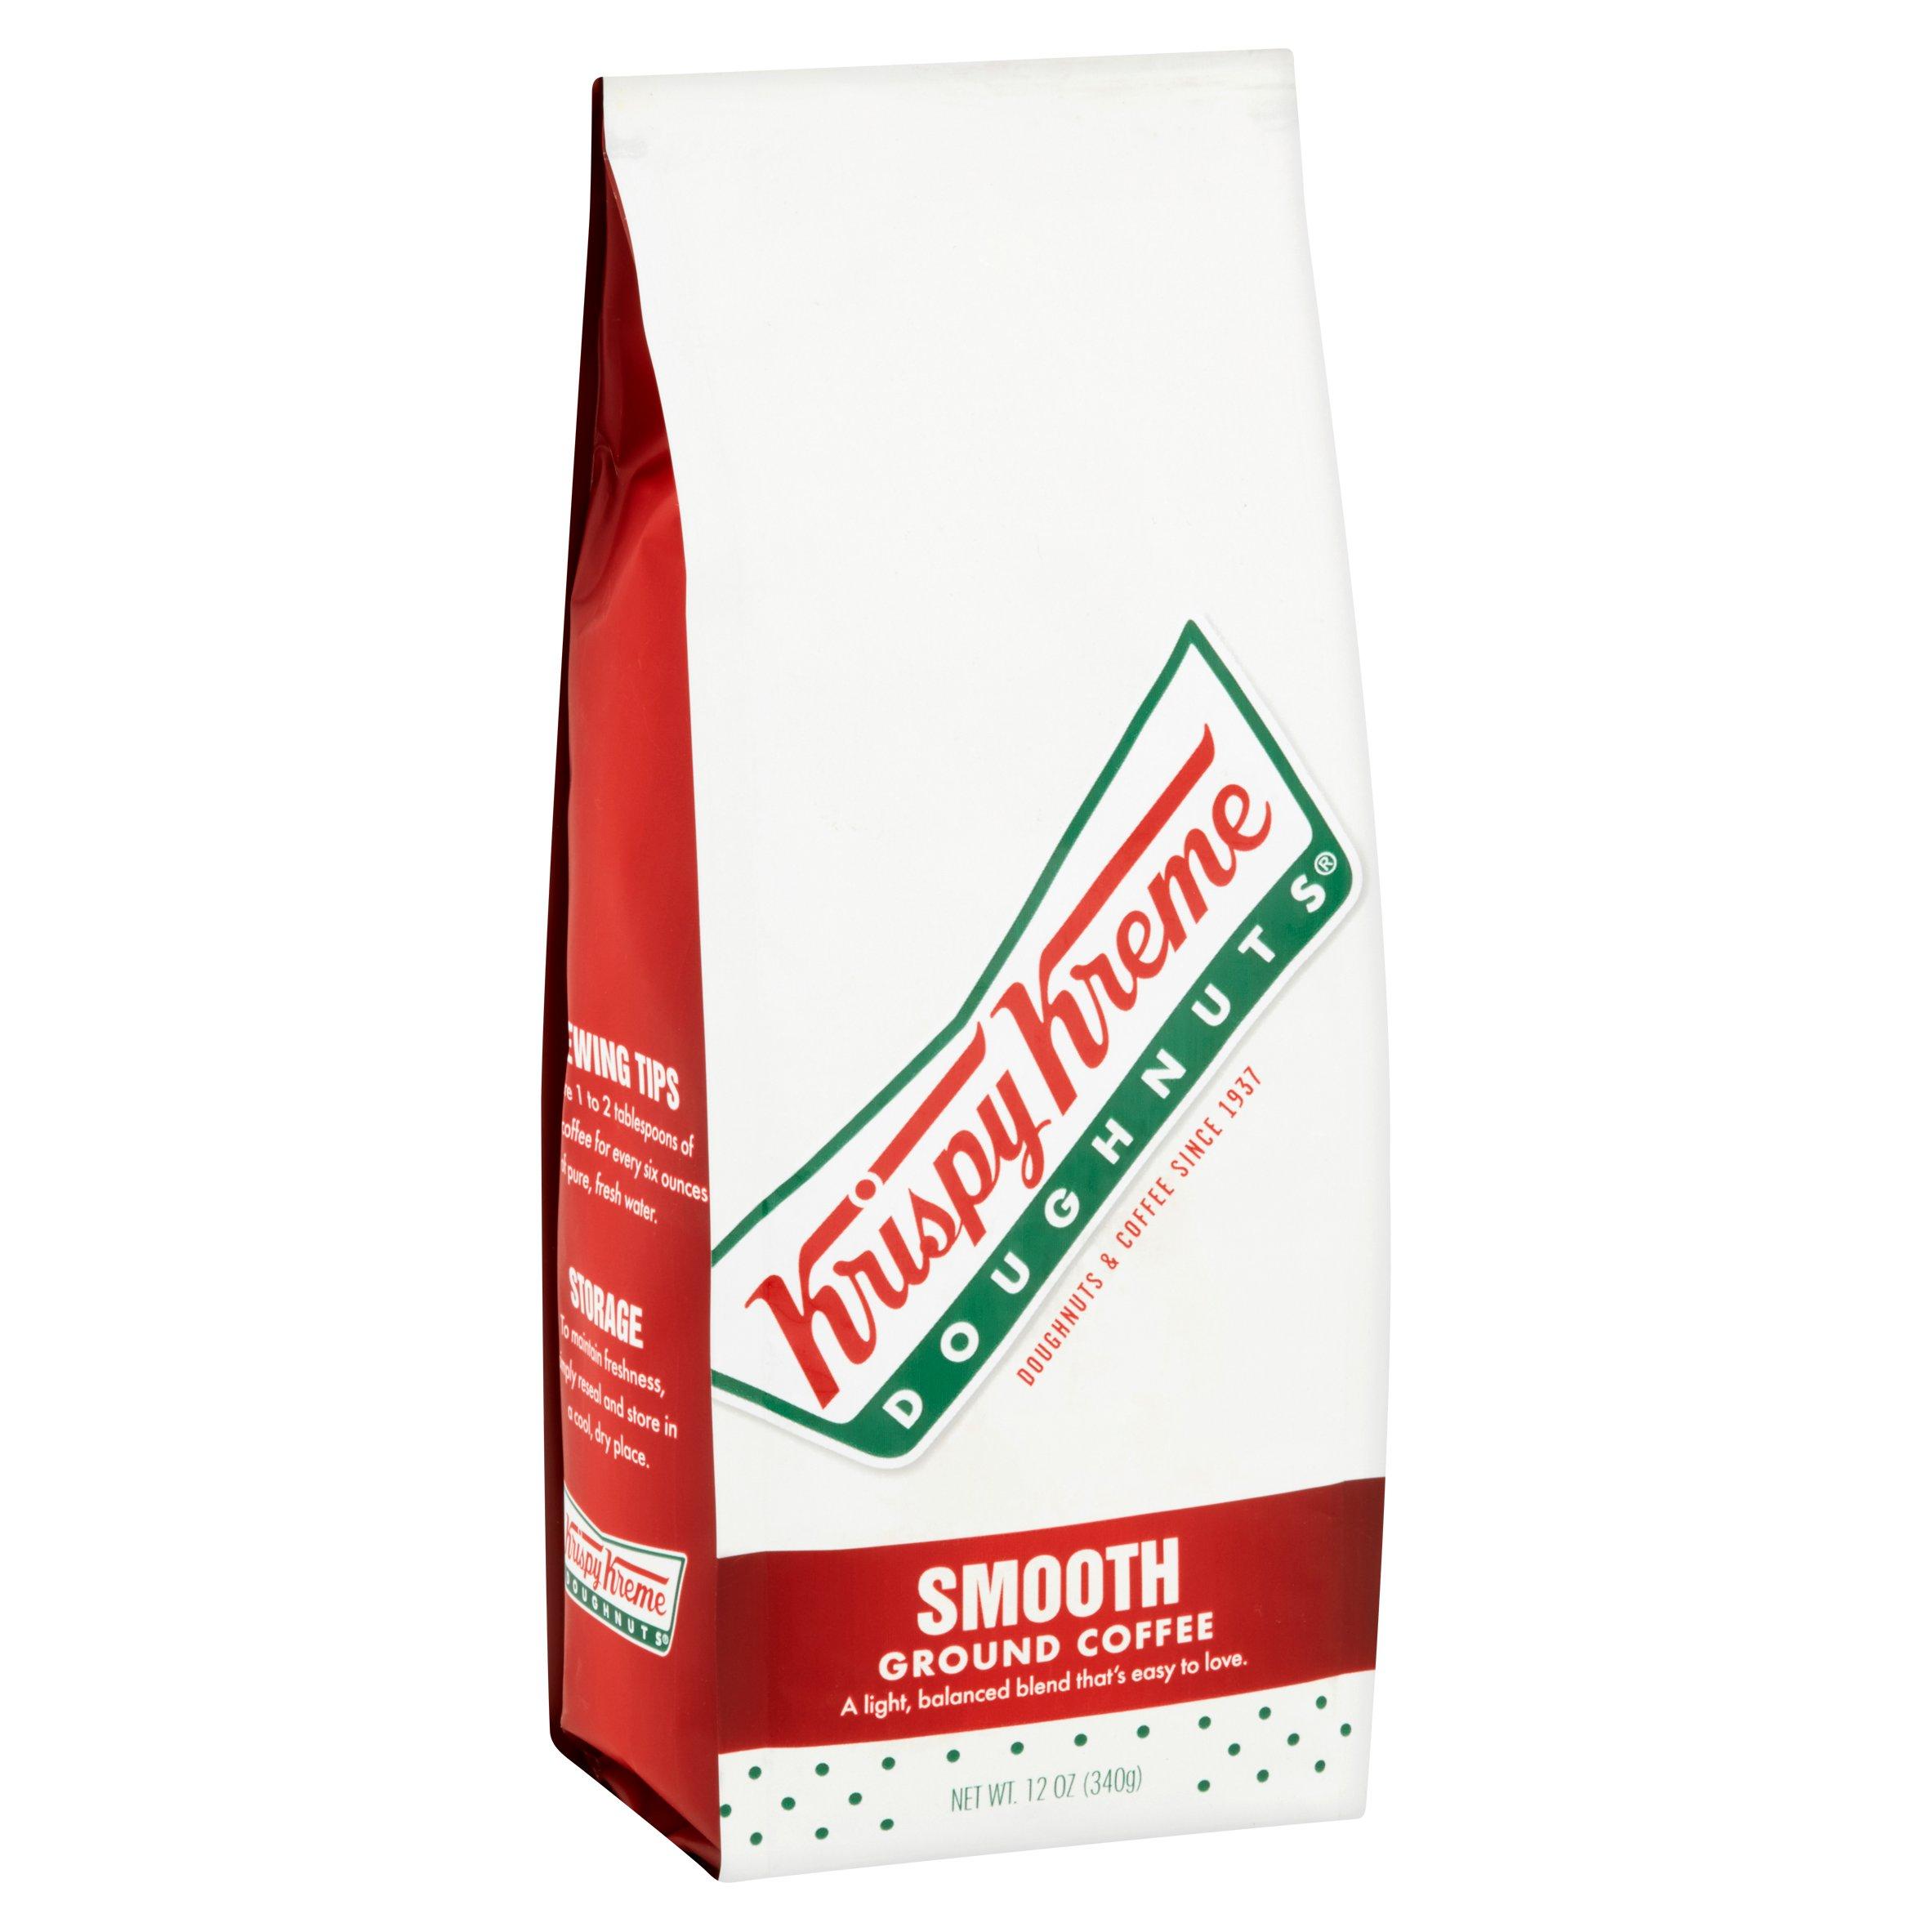 Krispy Kreme Doughnuts Coffee Smooth blend ground Pack of 4 12 ounce bag